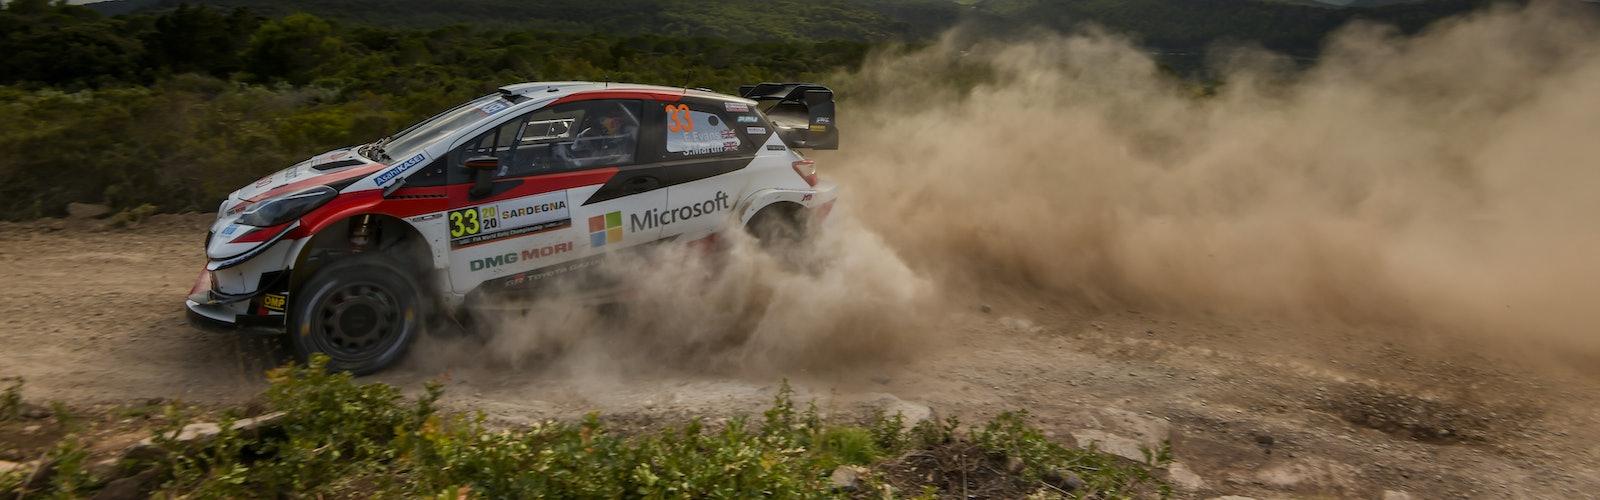 WRC_2020_Rd.6_164